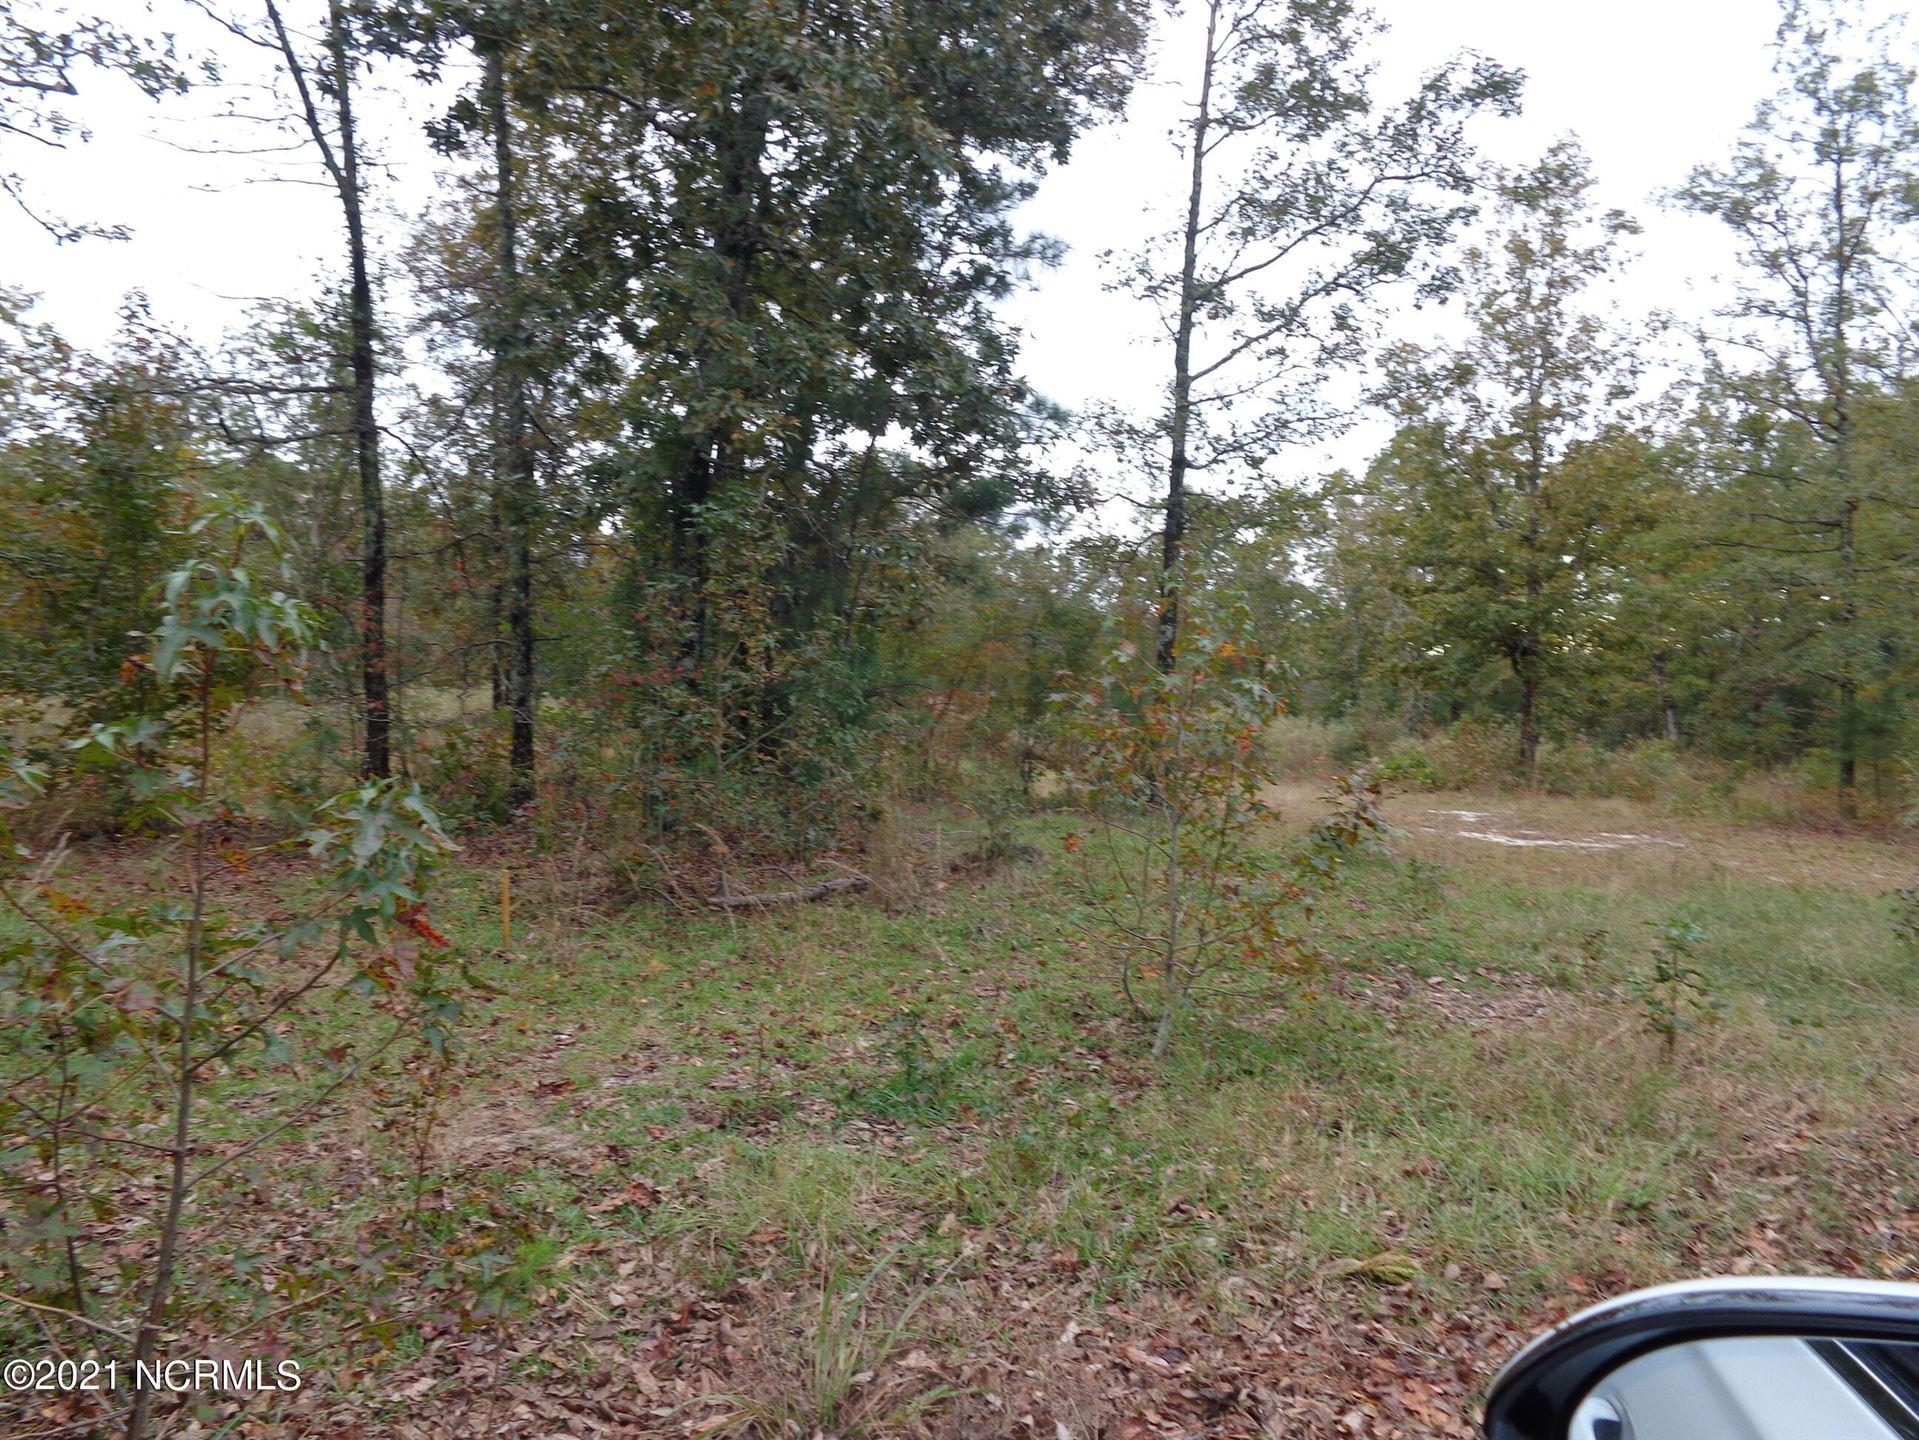 Photo of Tbd # 2 Murray Manor Lane, Rockingham, NC 28379 (MLS # 100296583)